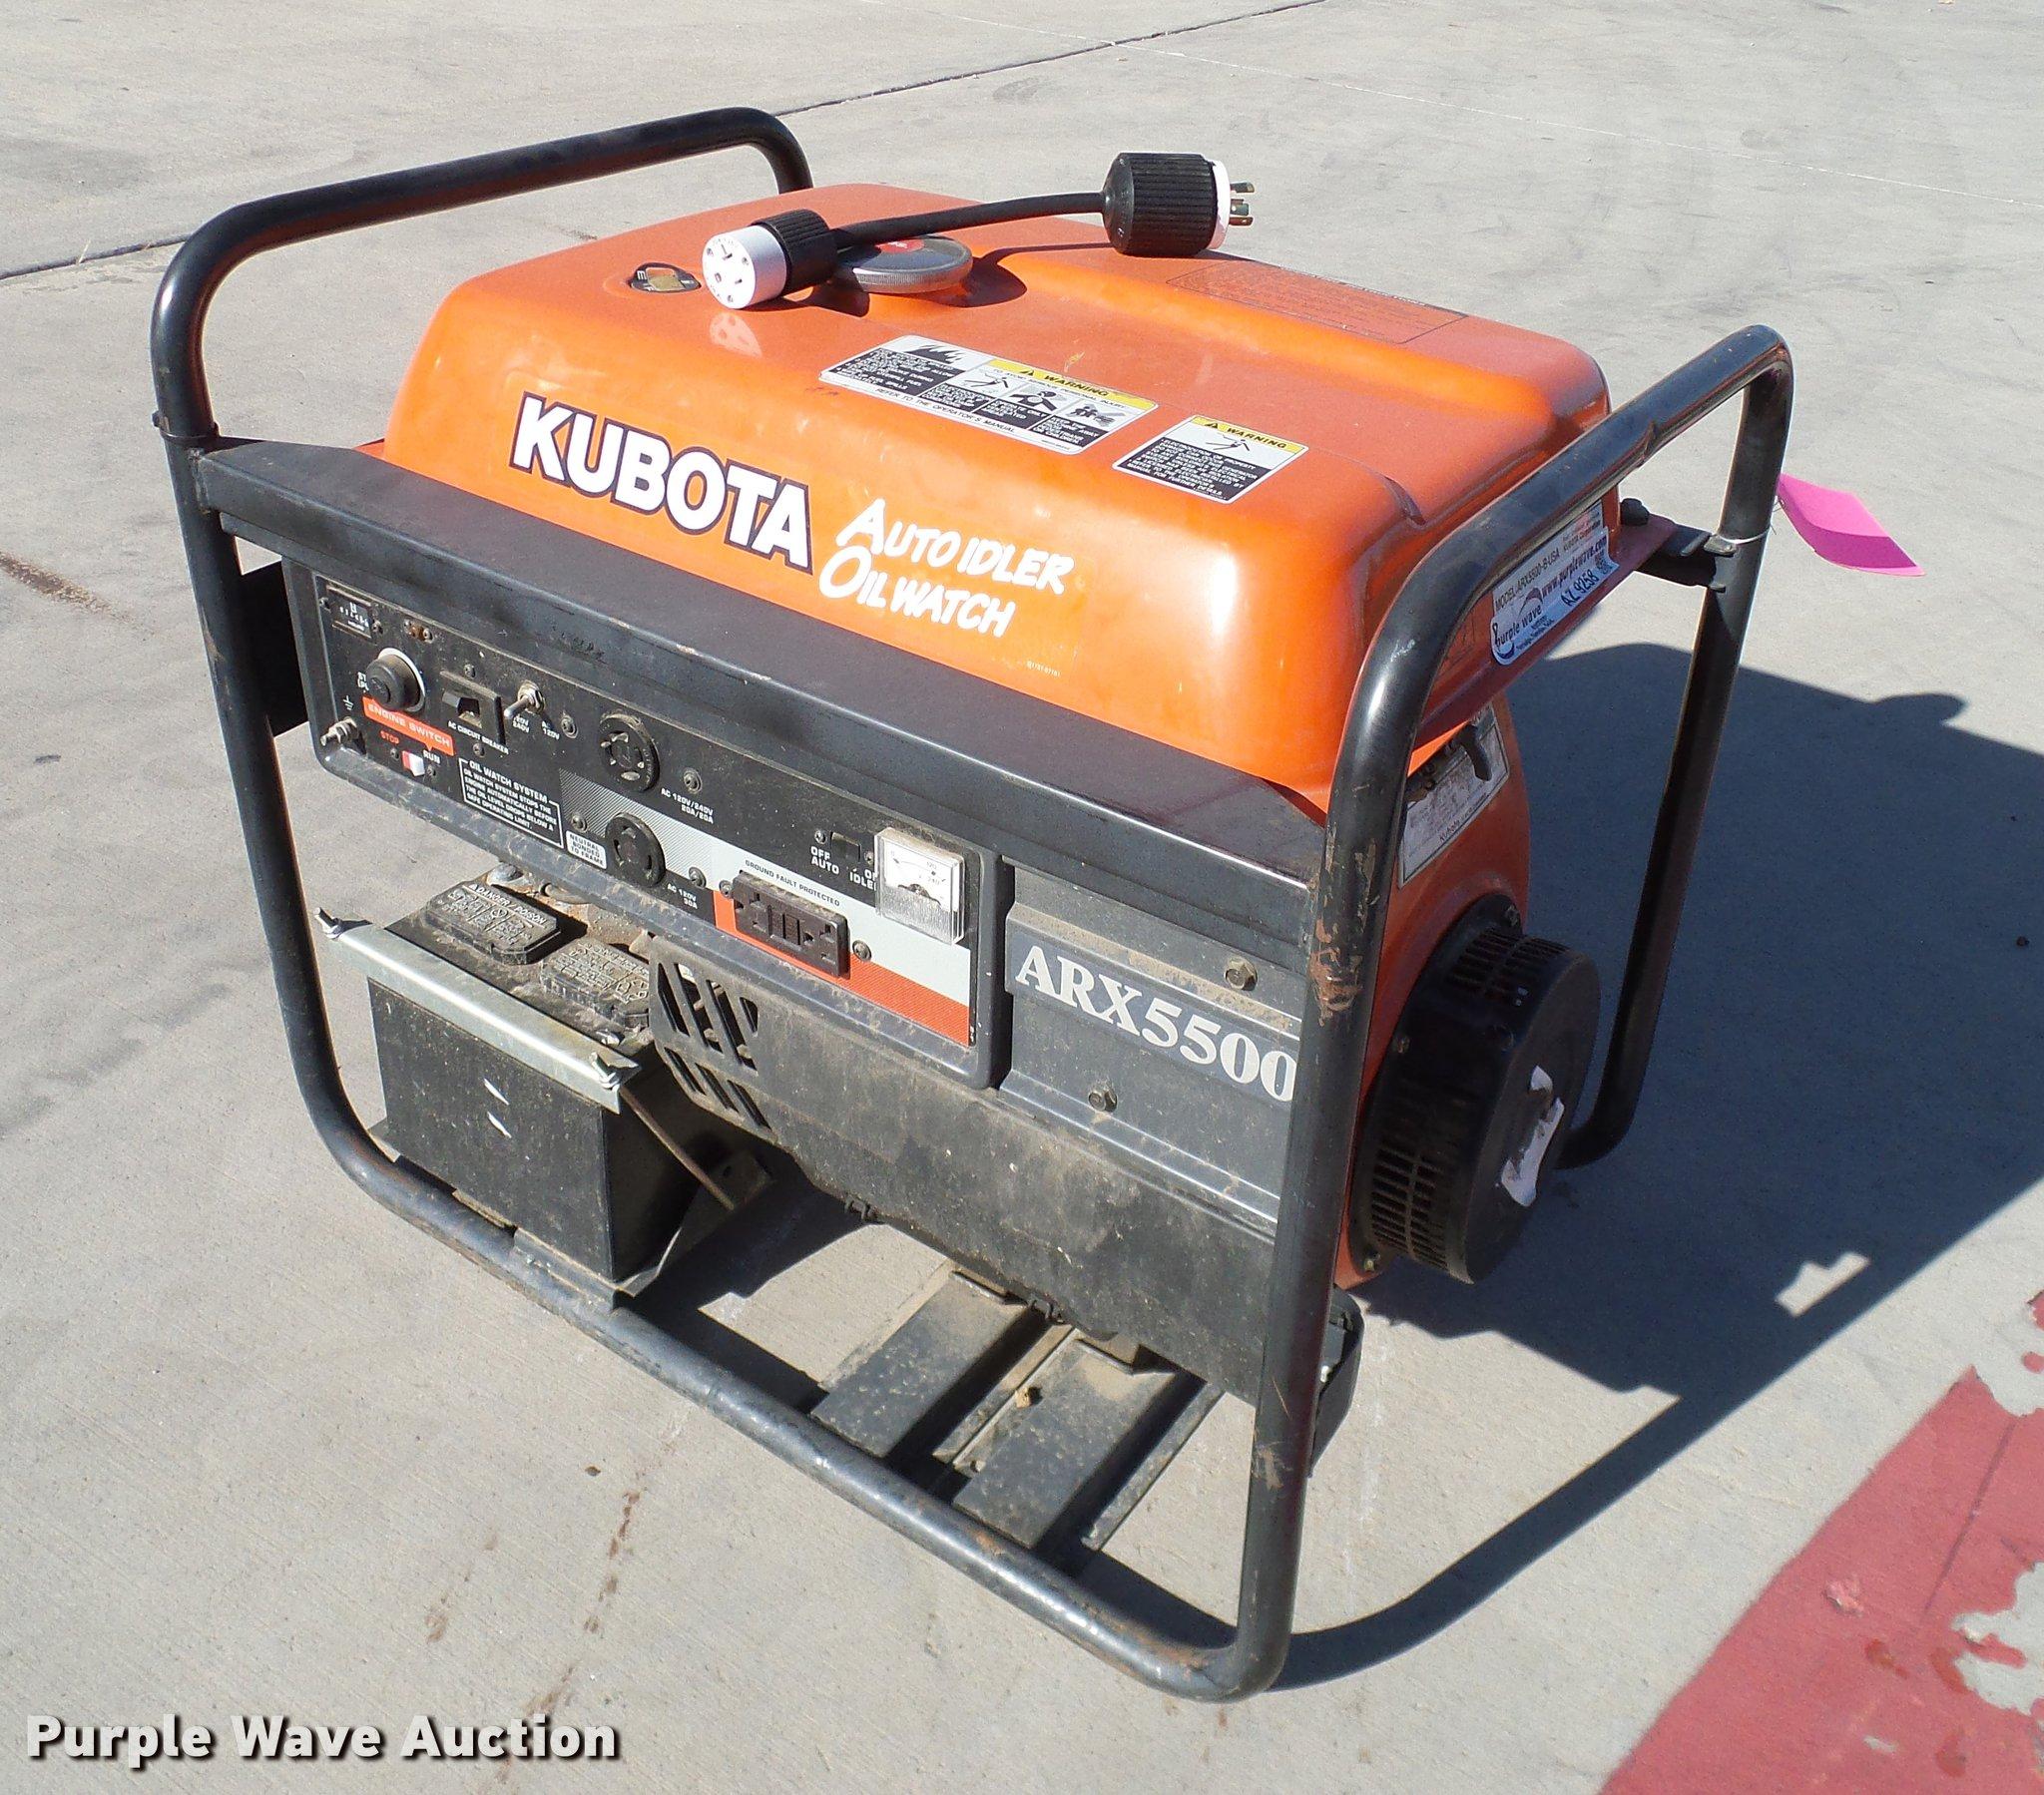 Kubota ARX5500 generator Item AZ9258